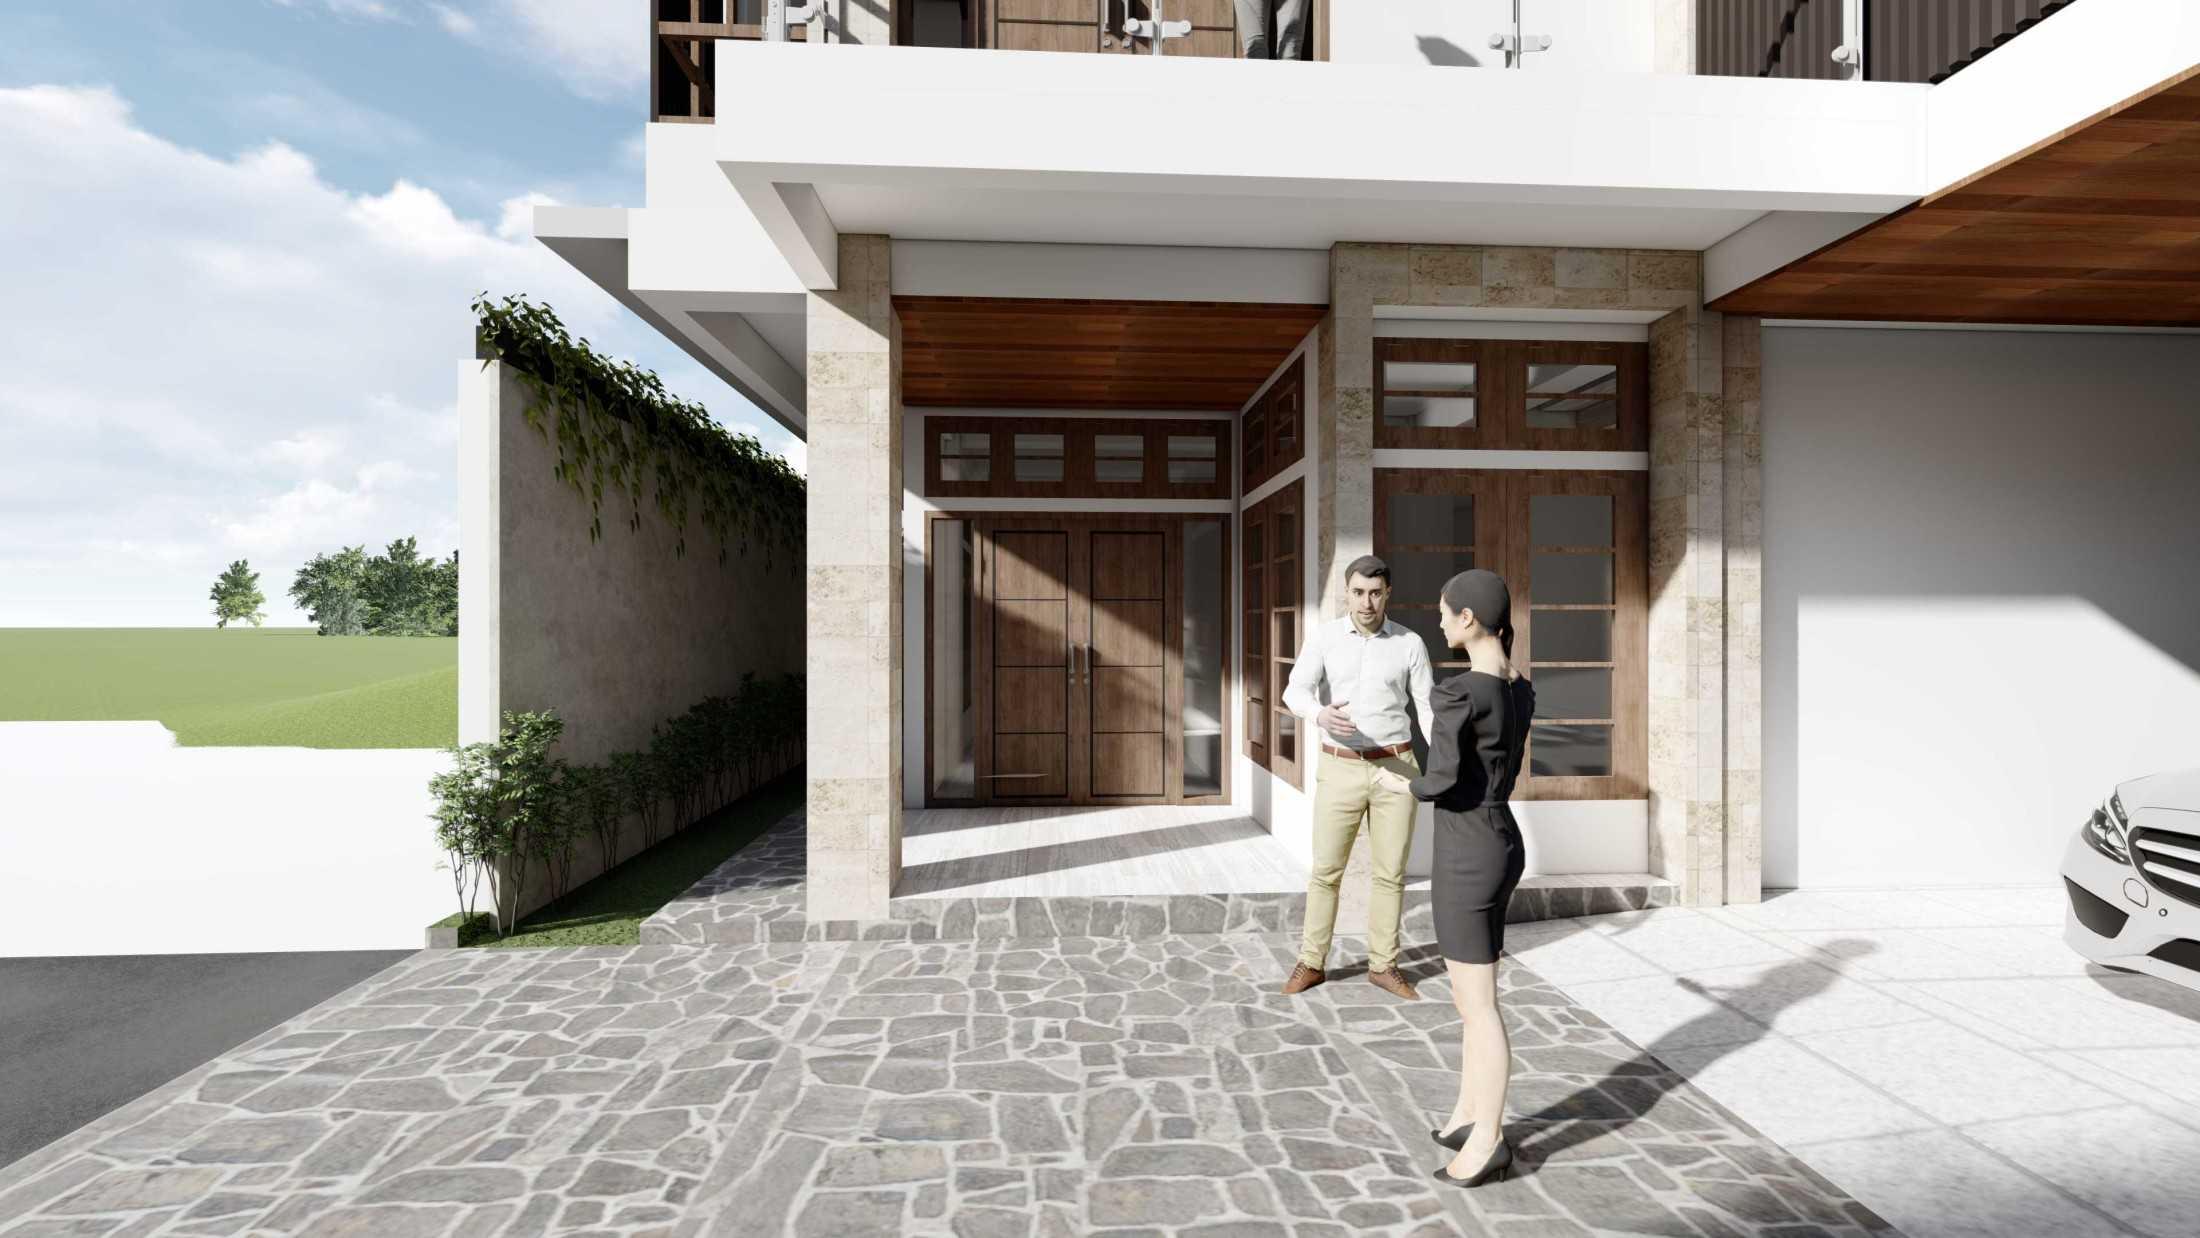 Astabumi Studio Js House Timor Leste Dili, Timor-Leste Pati, Kec. Pati, Kabupaten Pati, Jawa Tengah, Indonesia Cv-Astabumi-Manunggal-Prakarsa-Js-House-Timor-Leste  119262